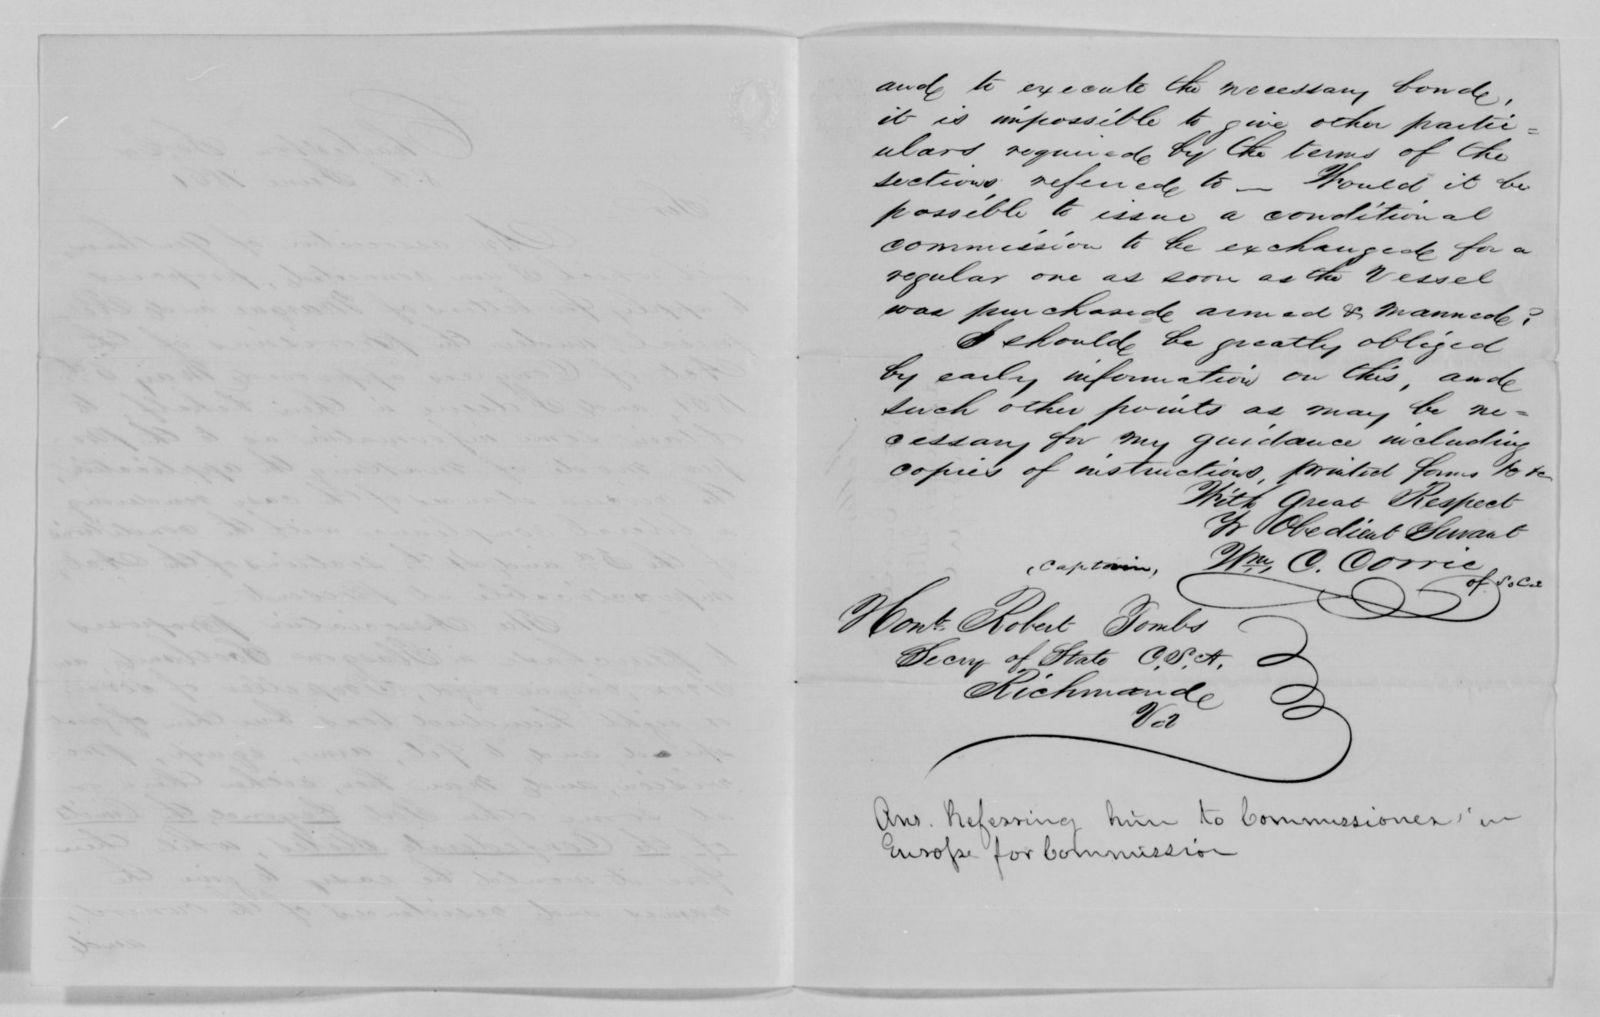 Confederate States of America records: Microfilm Reel 12